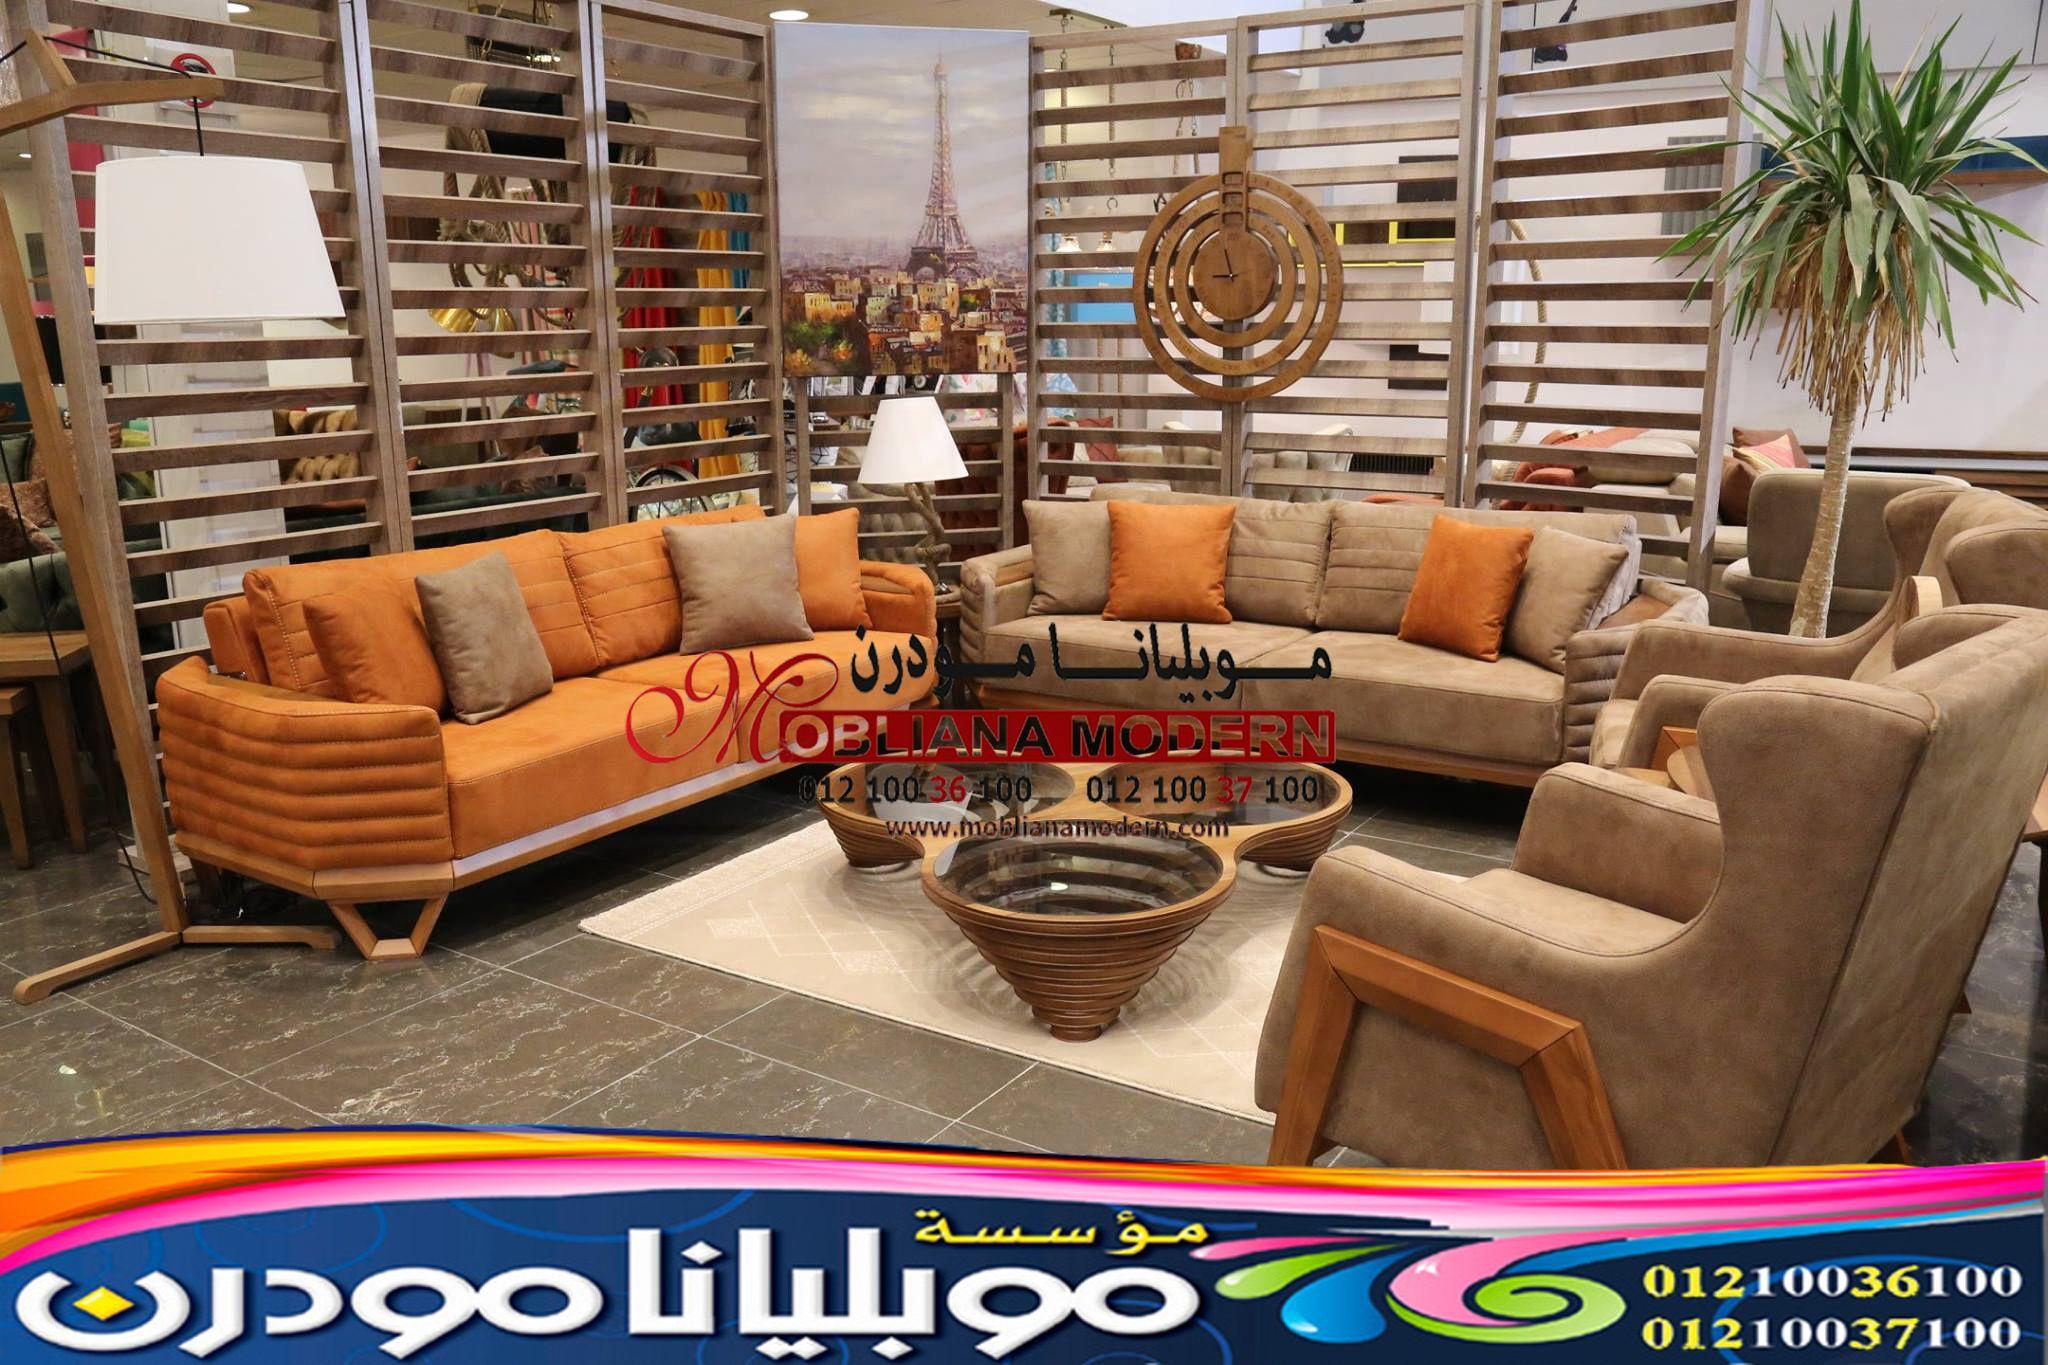 اثاث موبليانا مودرن كتالوج أحدث صور انتريهات مودرن و كلاسيك 2021 Furniture Home Furniture Home